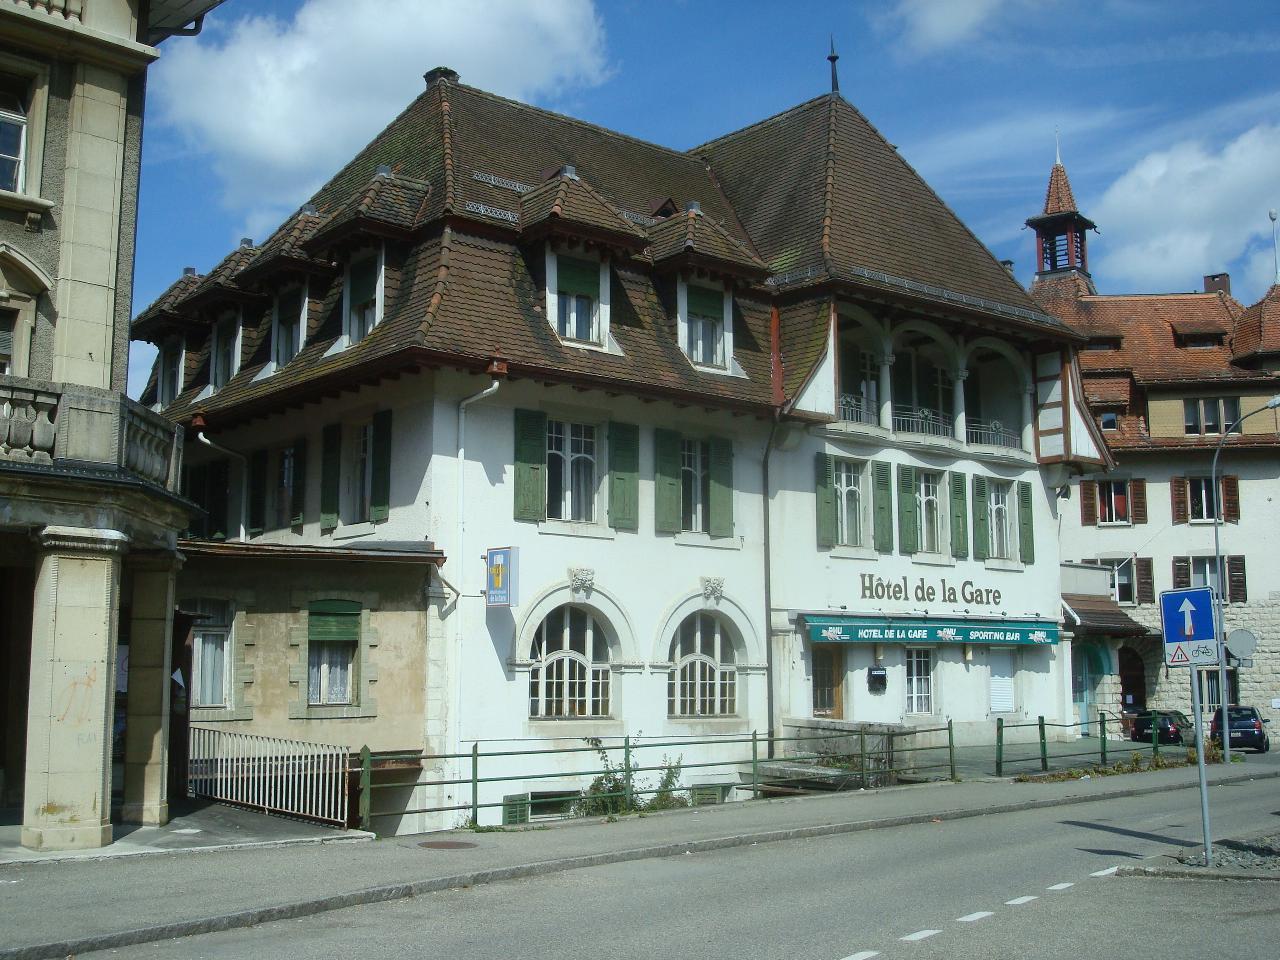 Hotel In Der Nahe Der Muhlenfeldstr Berlin